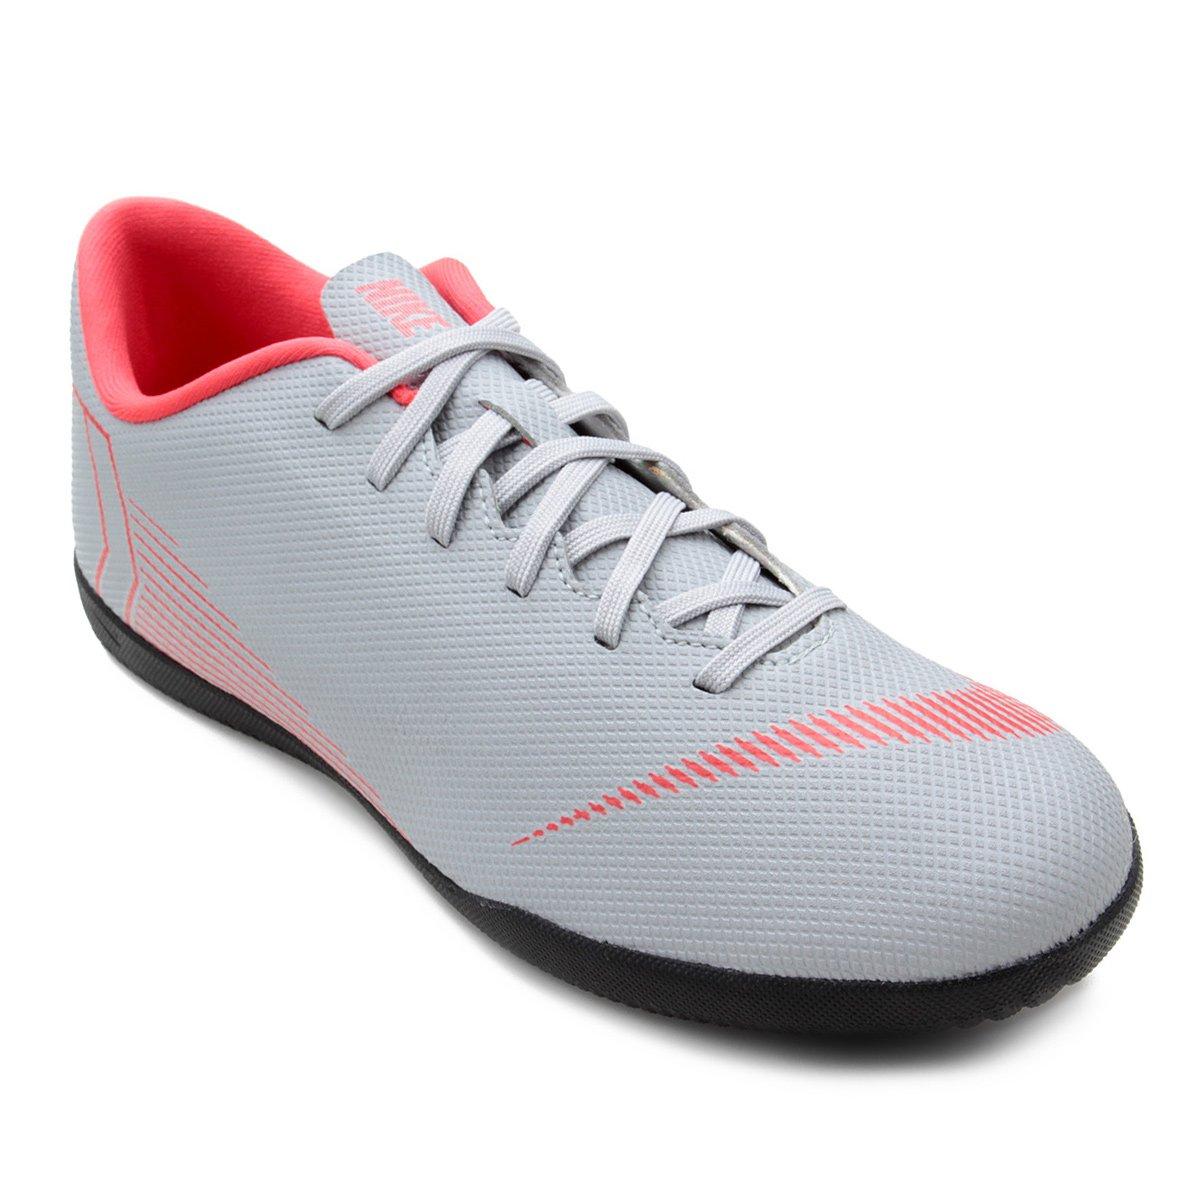 1a44c3cd395e6 Chuteira Futsal Nike Mercurial Vapor 12 Club - Cinza e Preto - Compre Agora